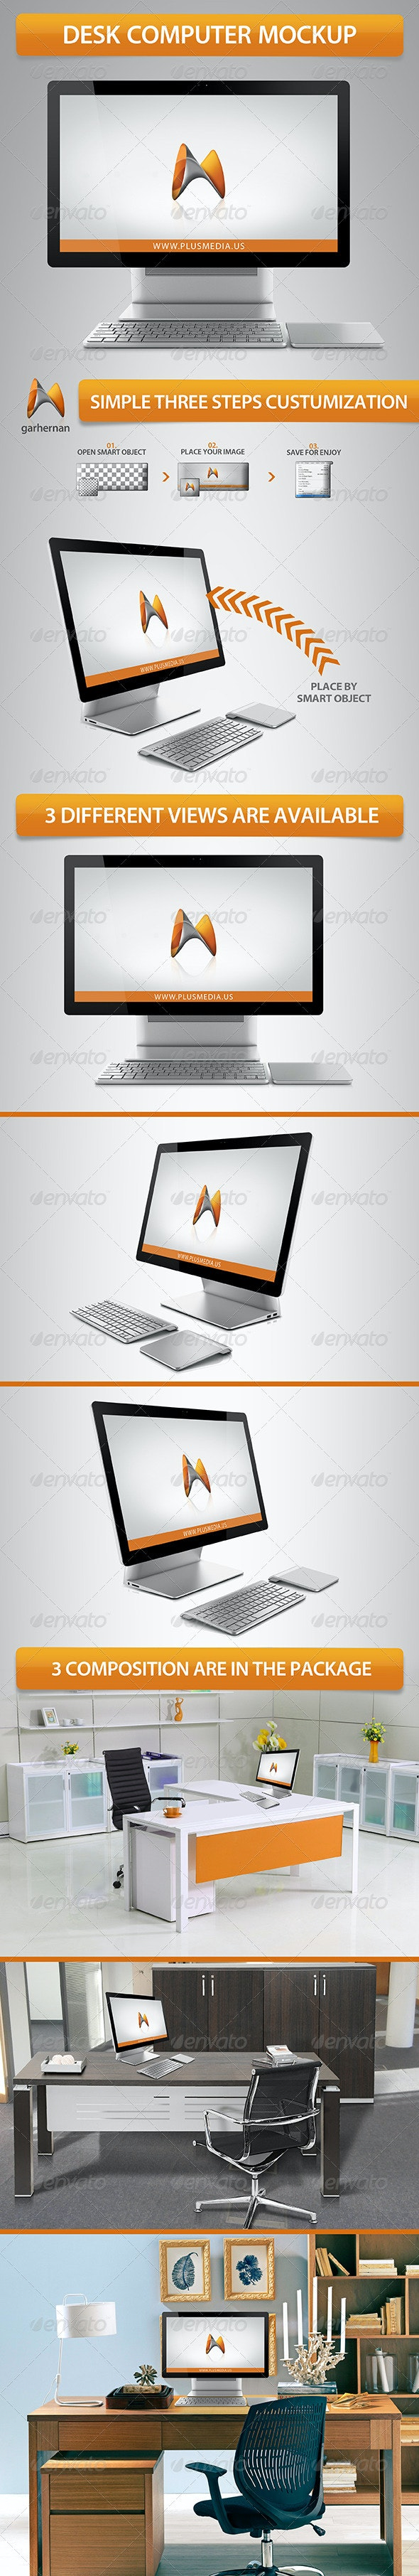 Desk Computer Mockup - Product Mock-Ups Graphics